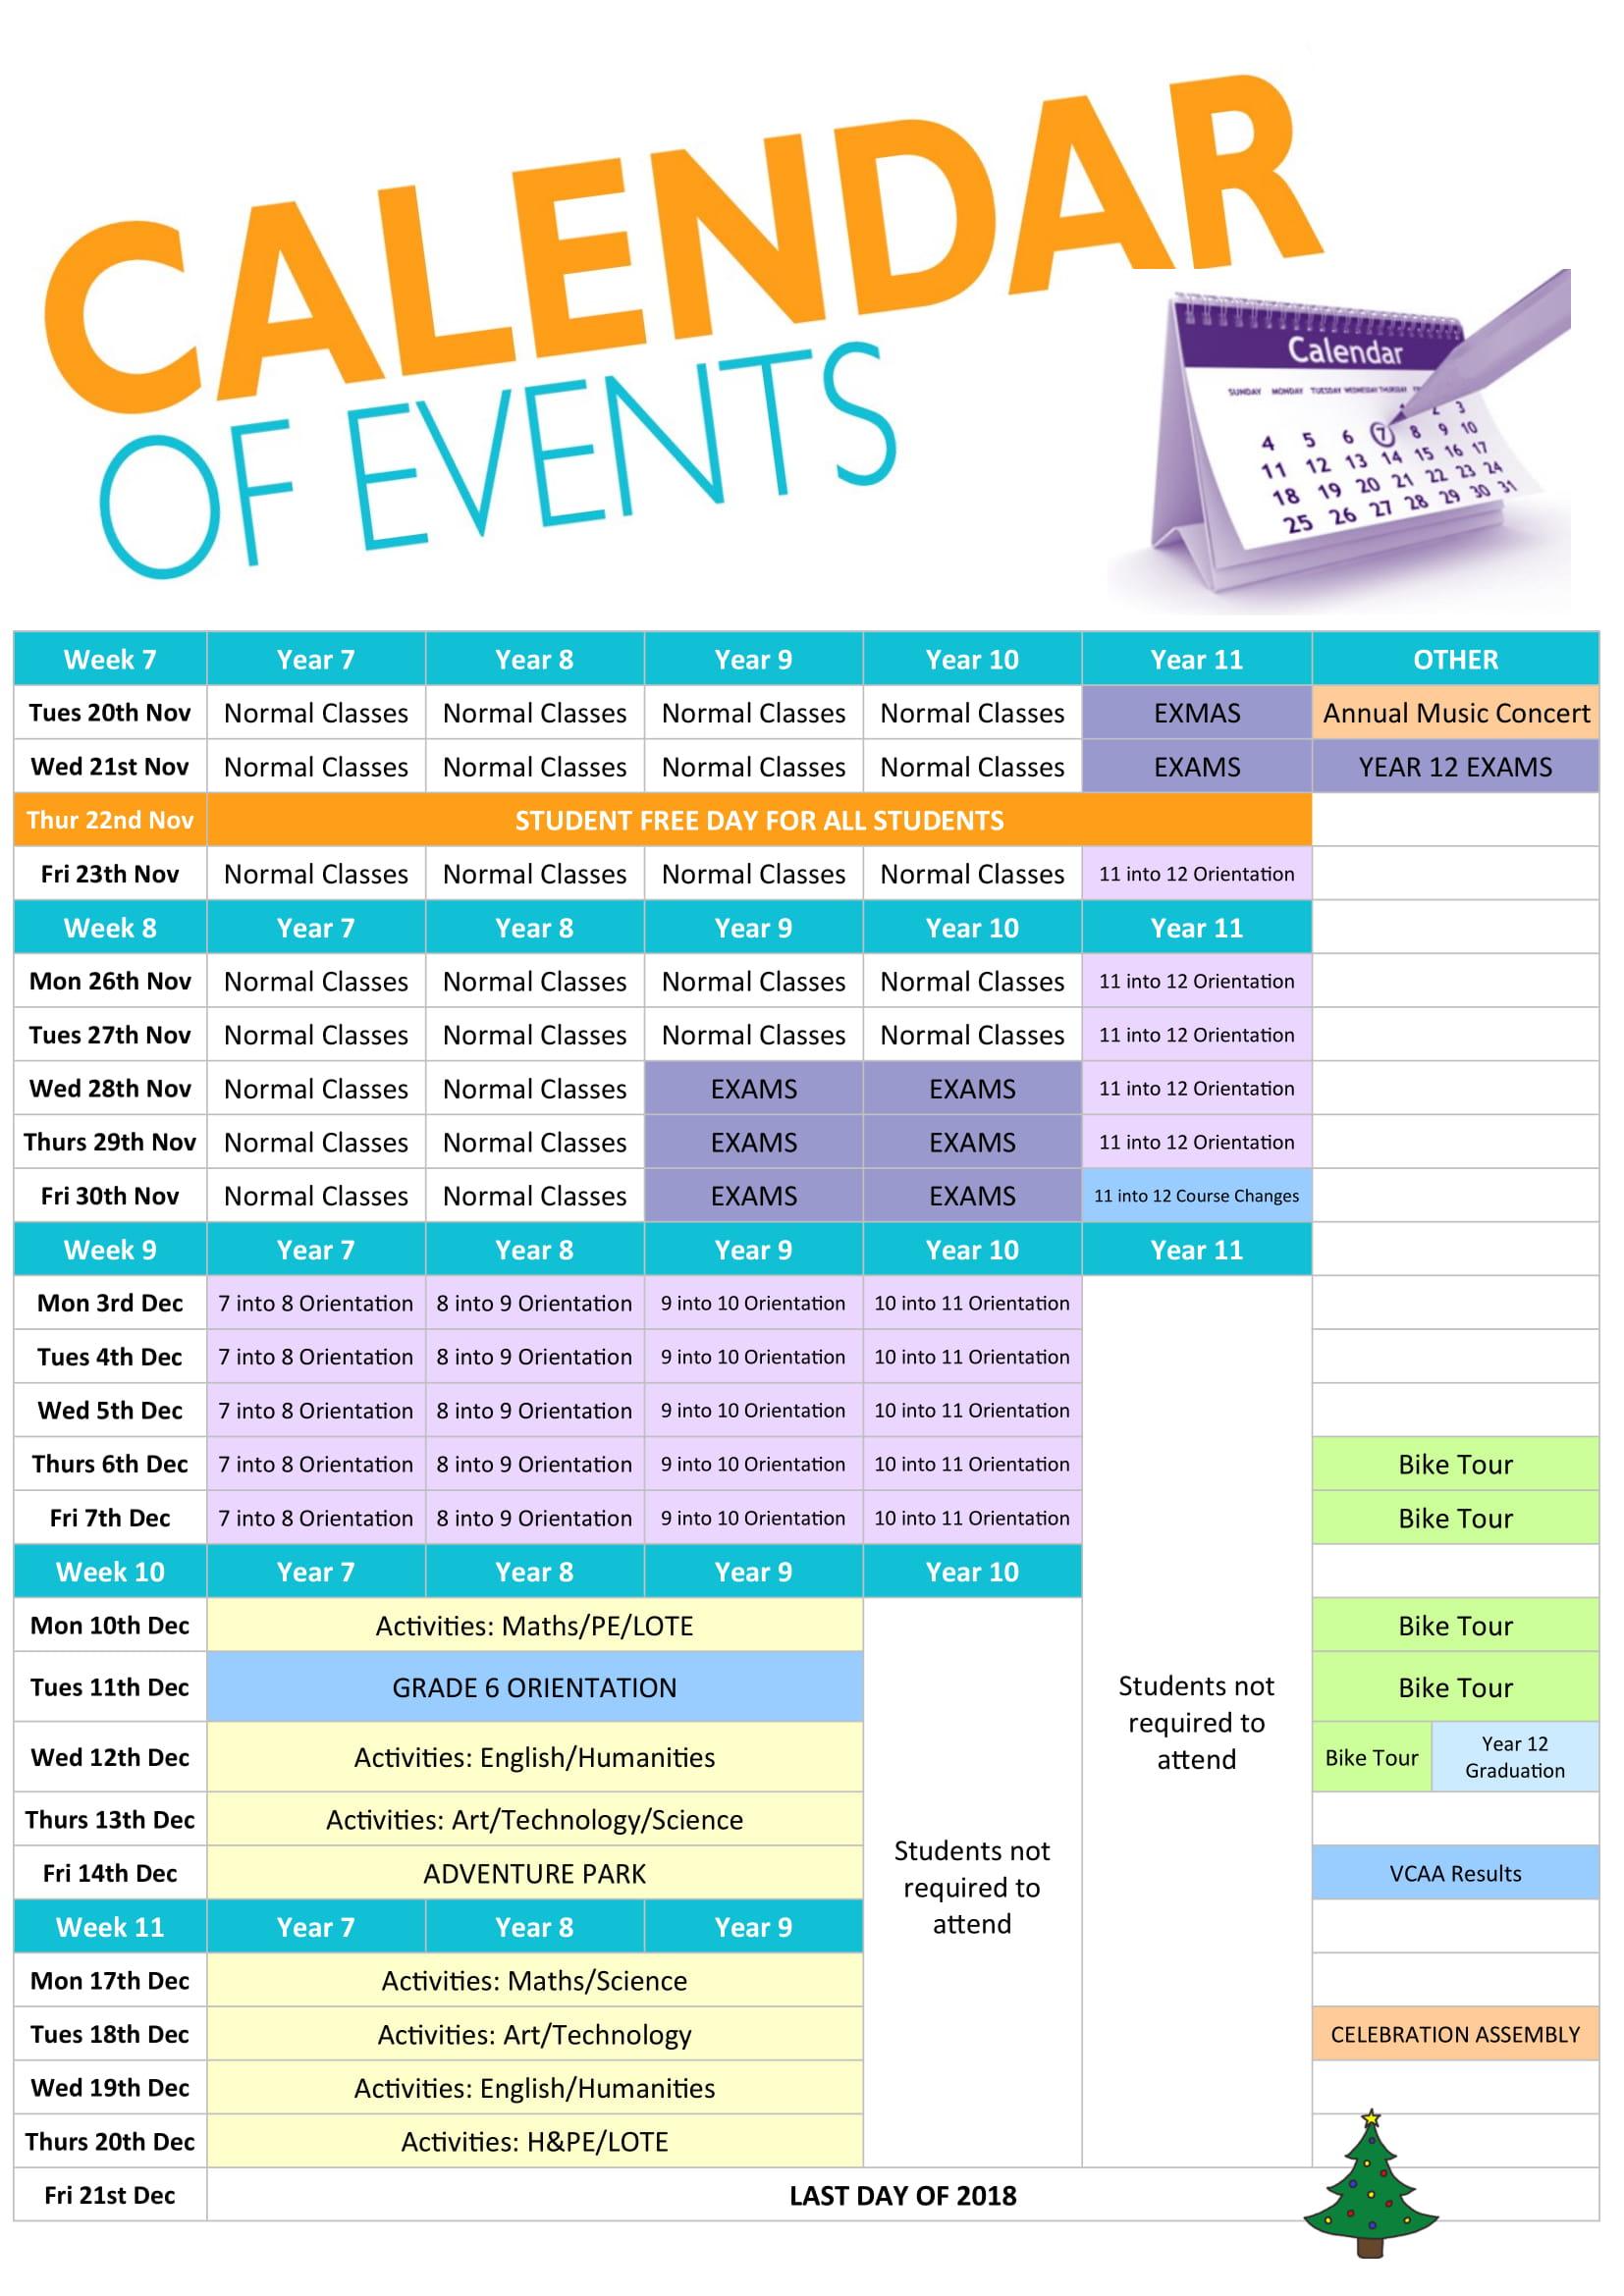 School Events Calendar Regarding Cash 3 Midday Yearly Calendar